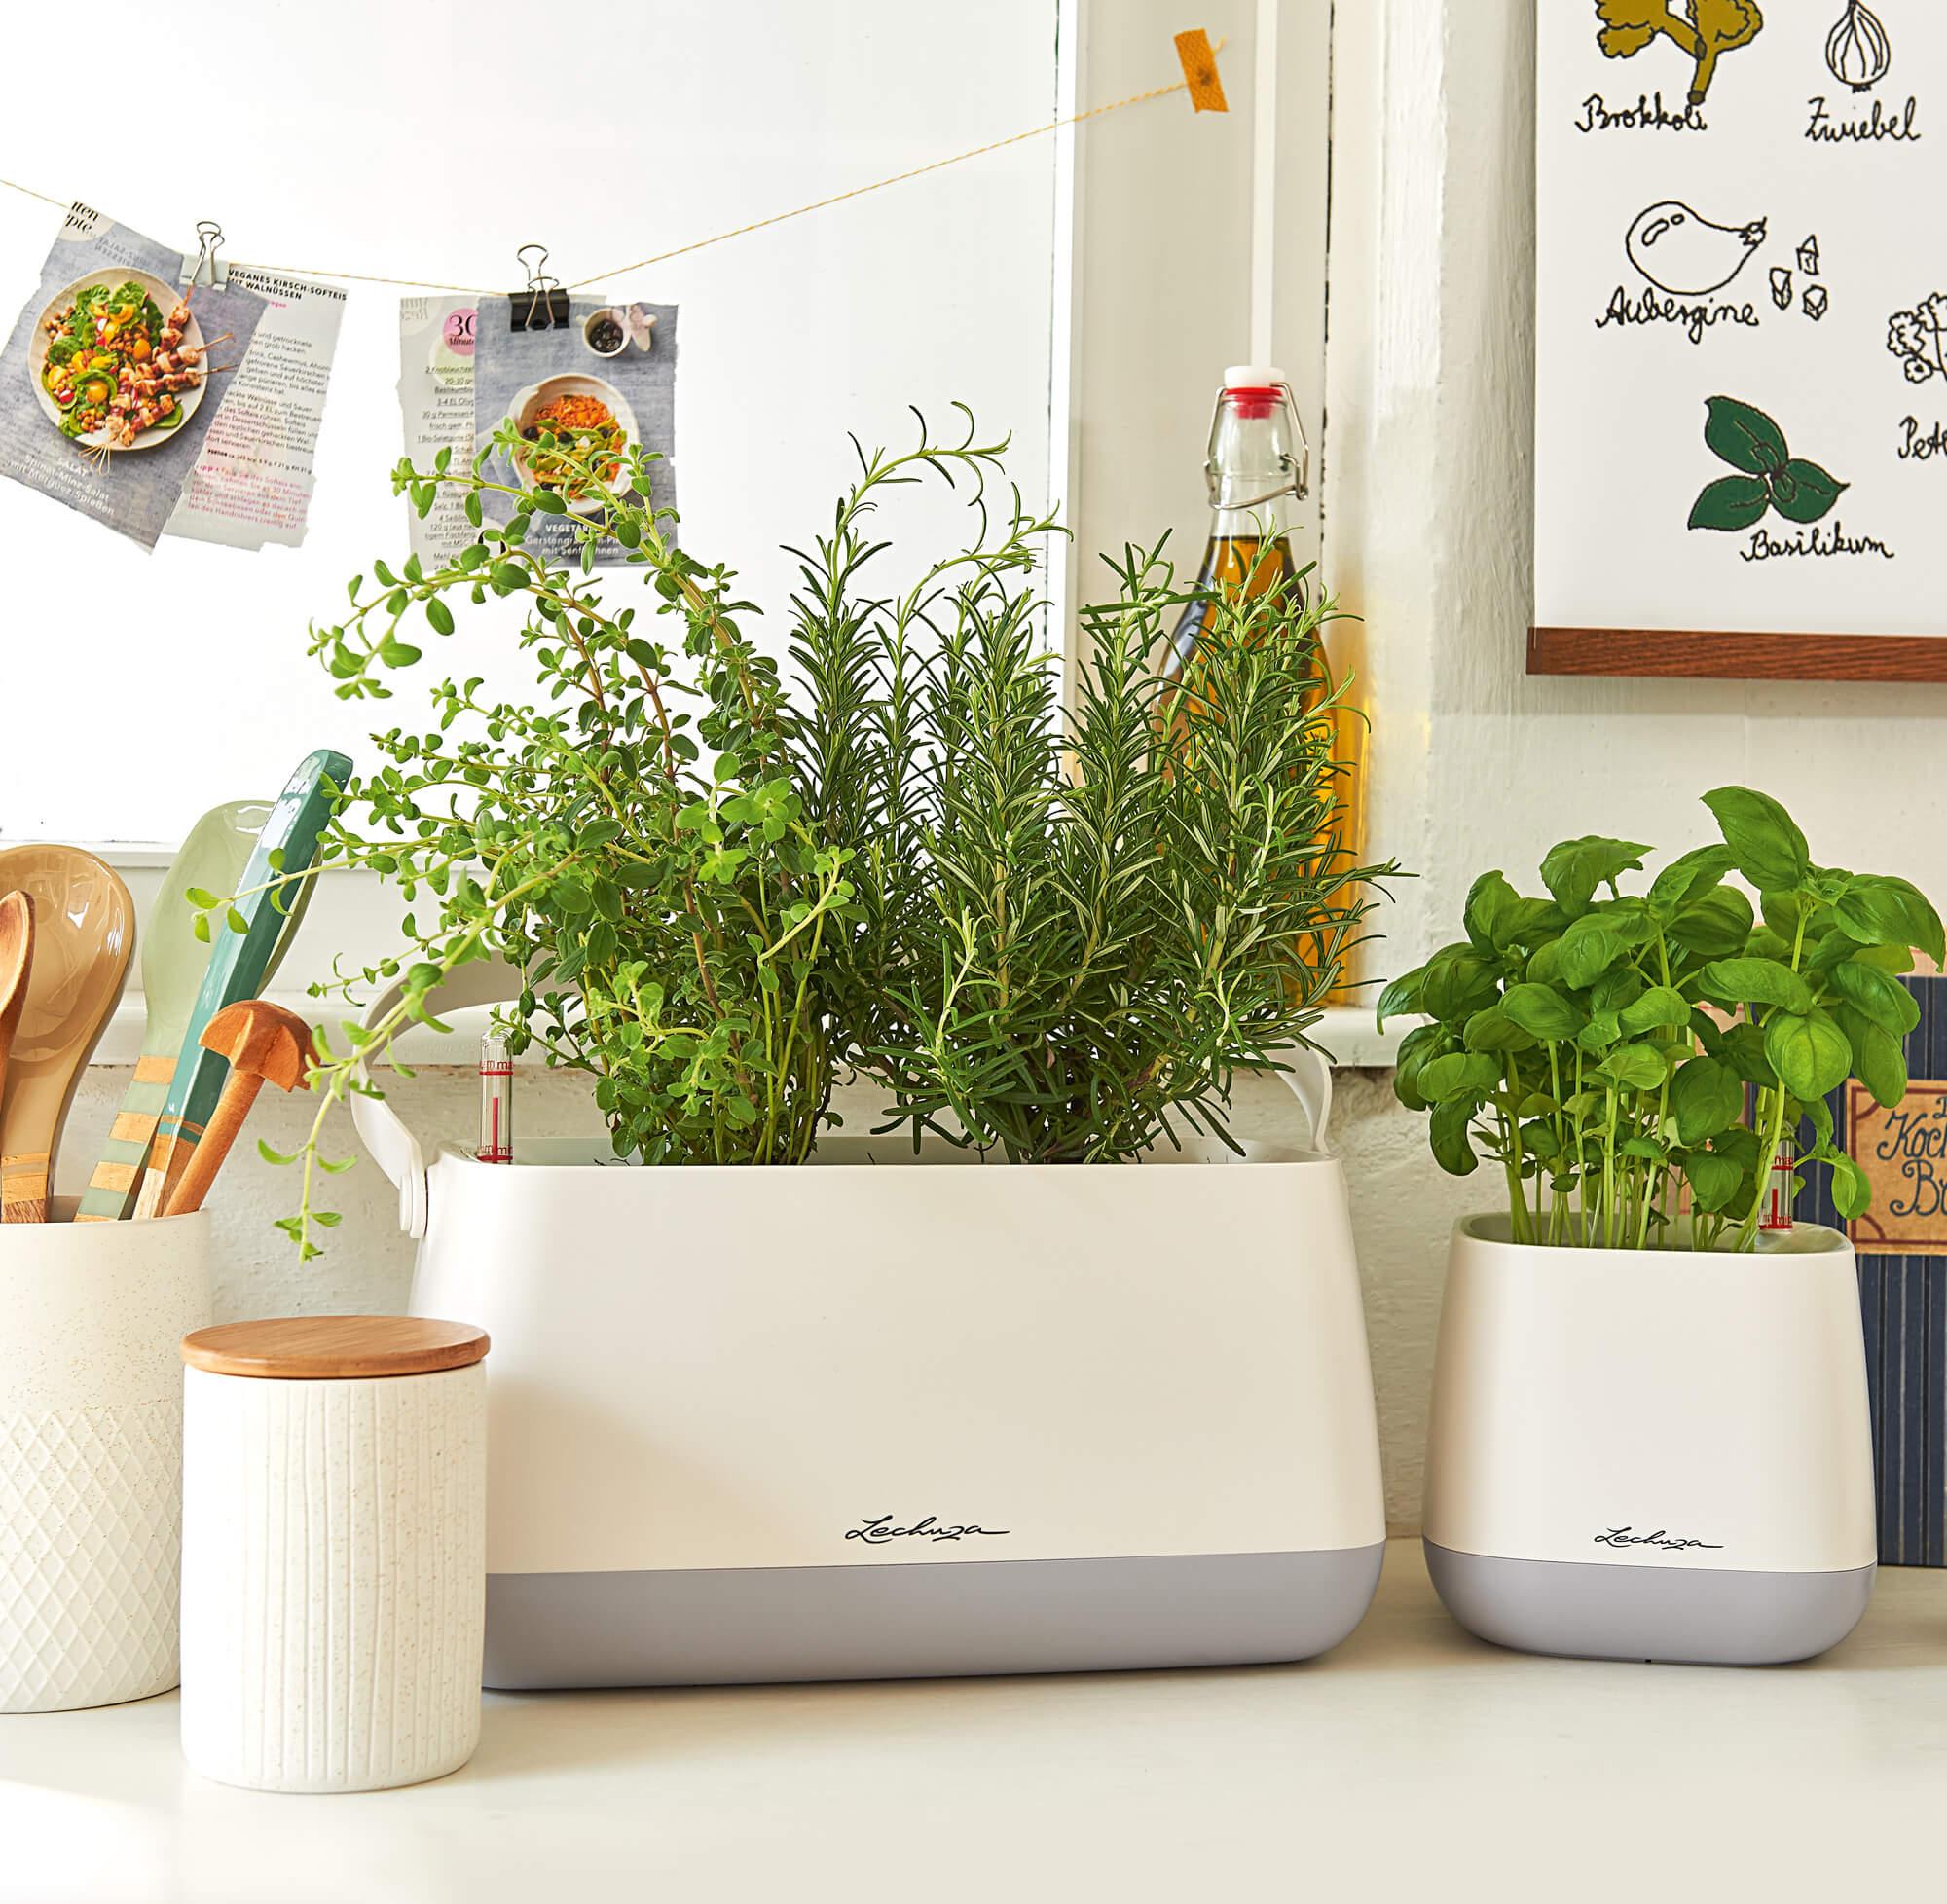 YULA Collection Μοντέρνες γλάστρες για βότανα στην κουζίνα